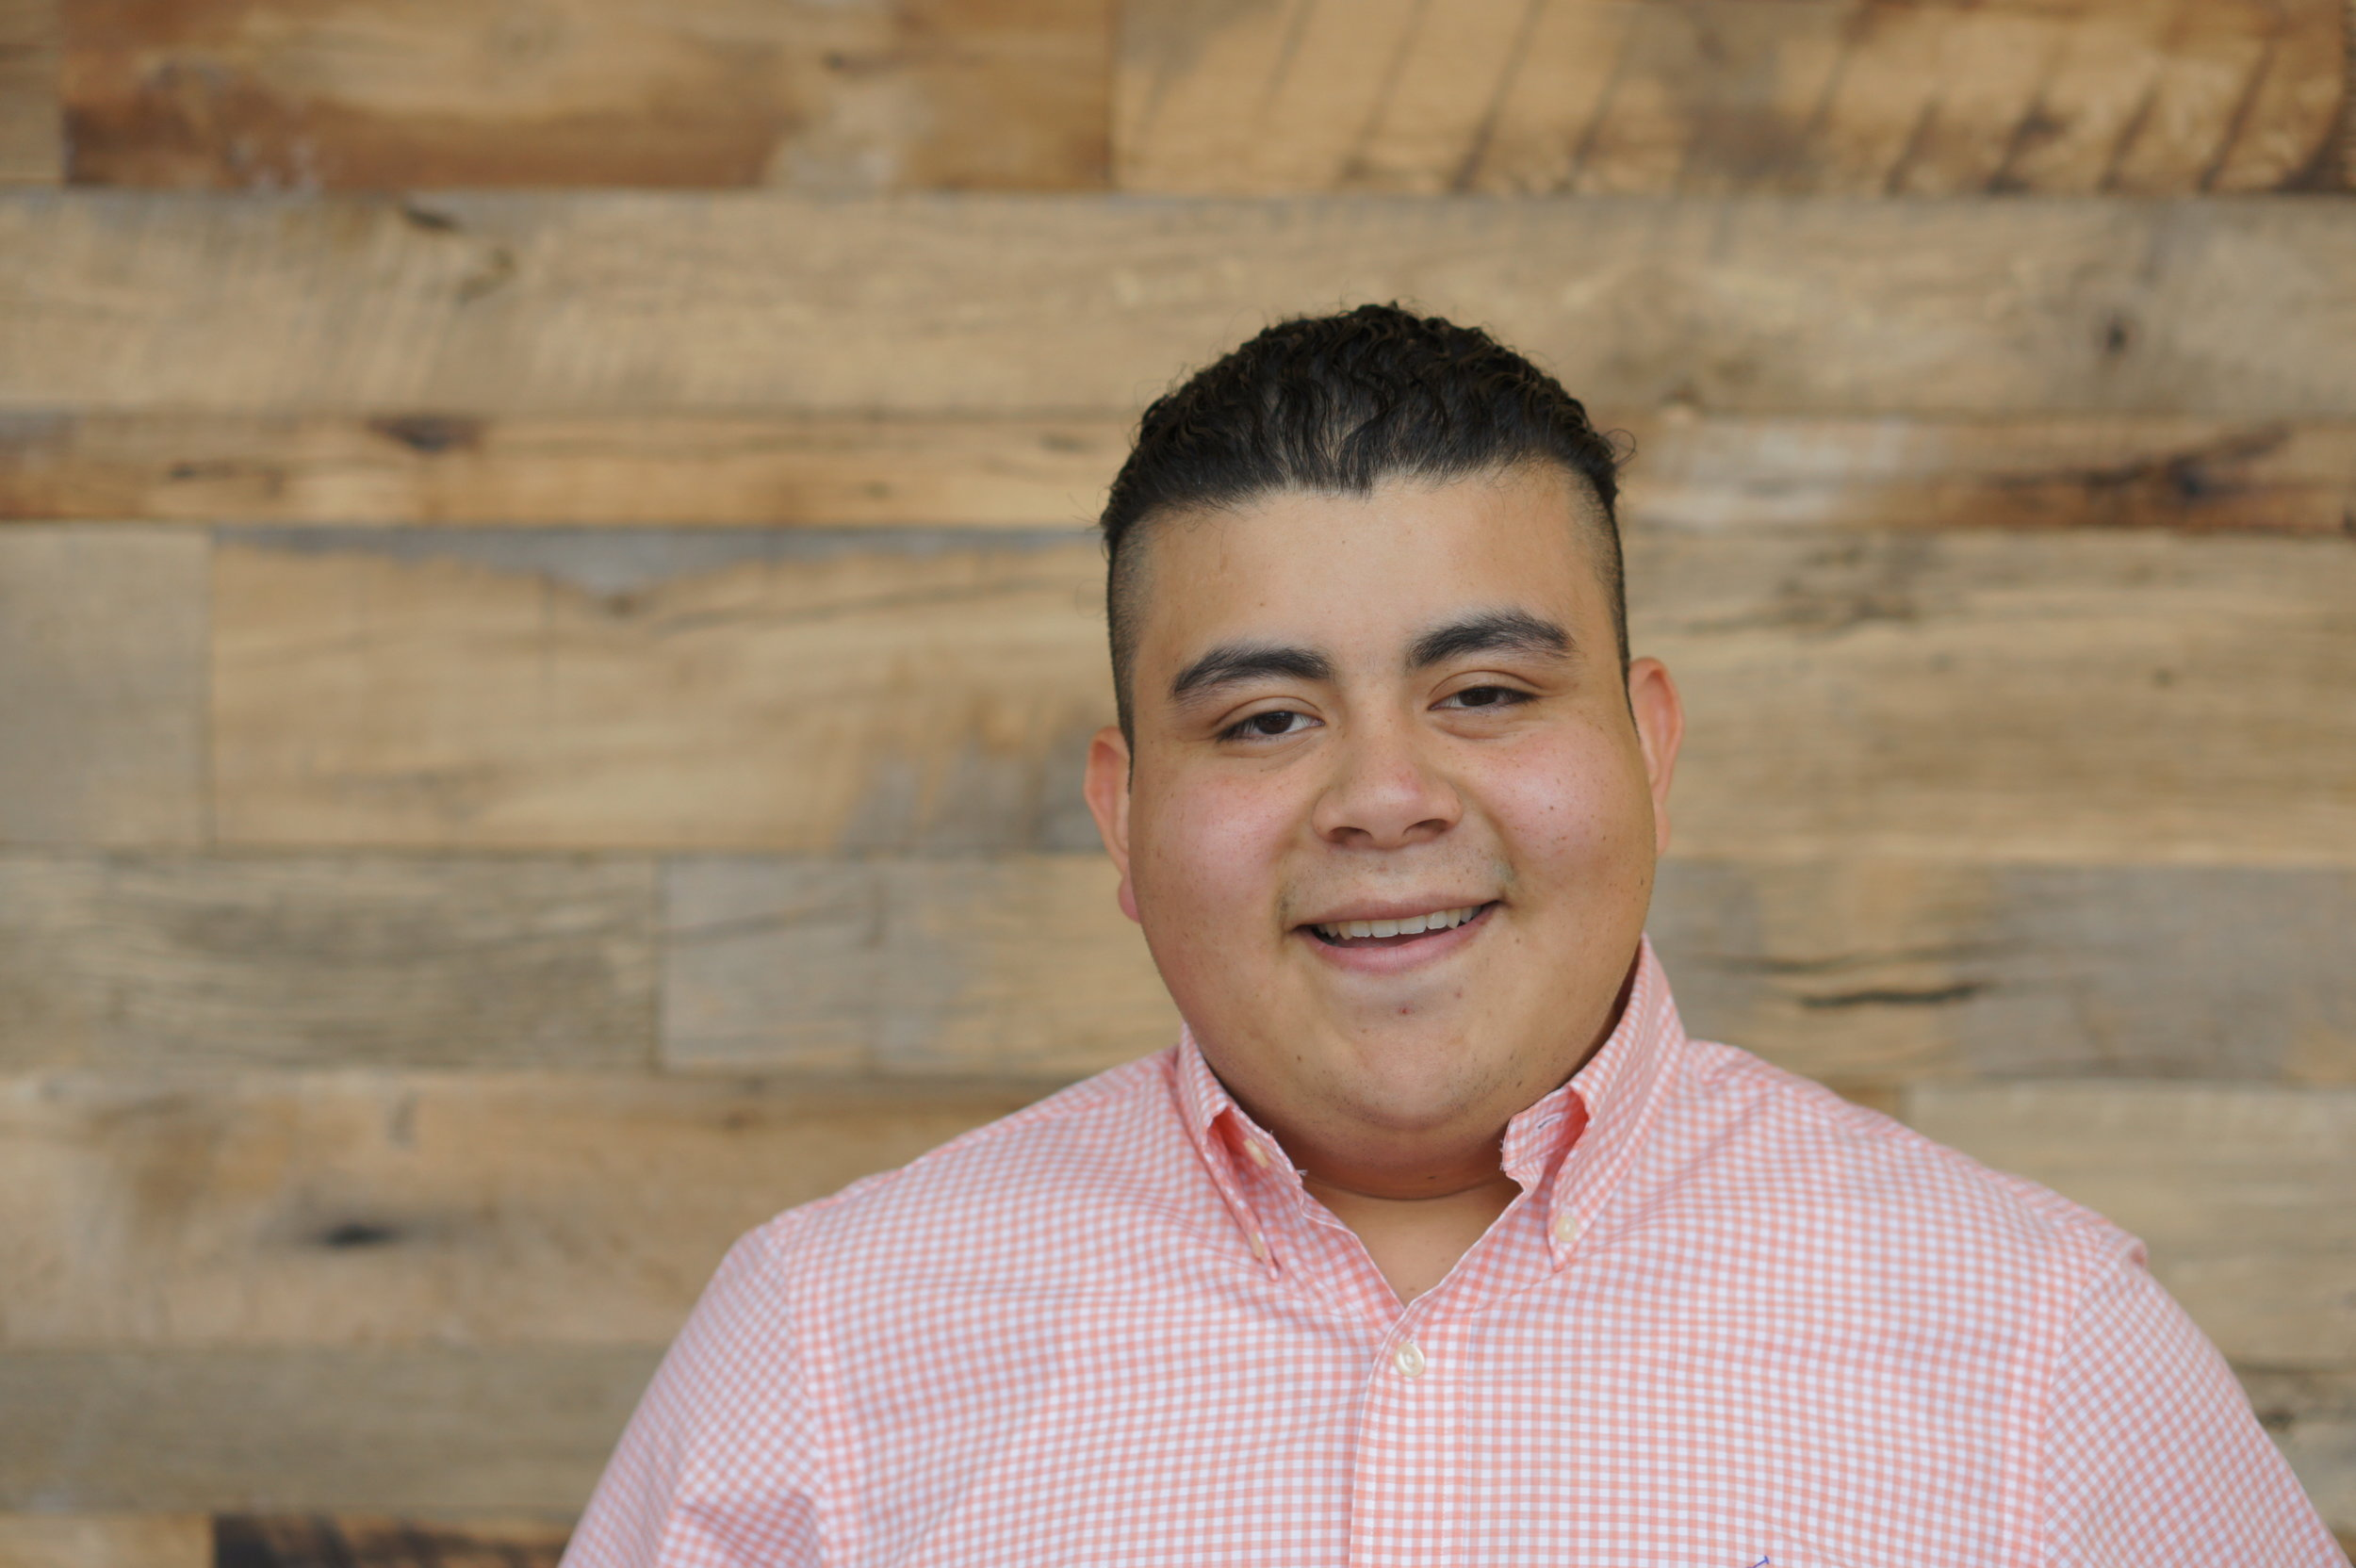 Bernardo Carrillo-Alcantara  Dental Hygienist, Freshman Forsyth Technical Community College  Mission Foods Distributors Scholarship